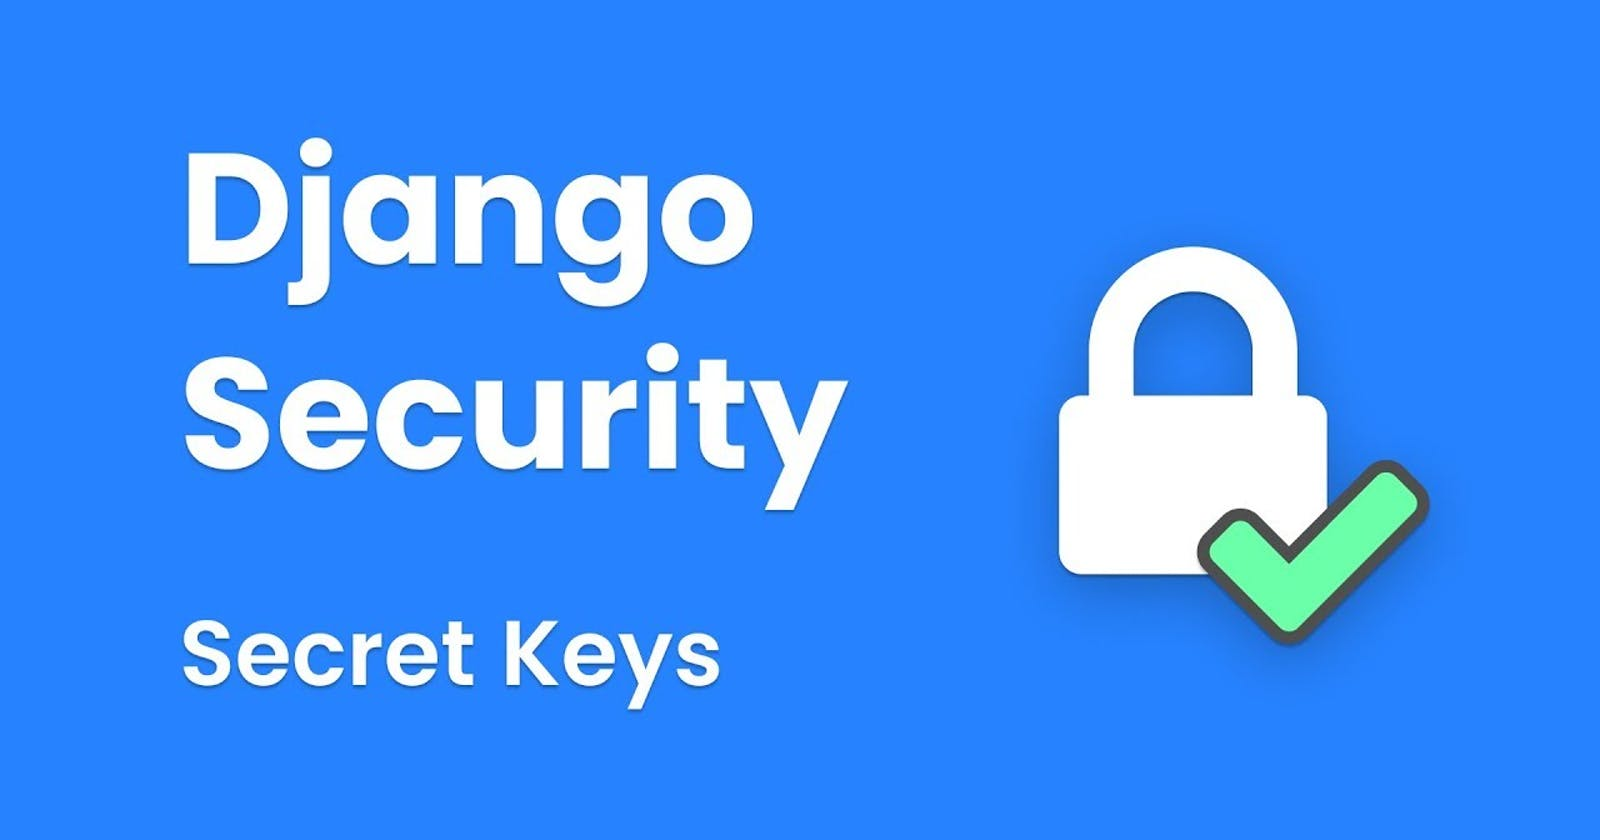 Django Secret Keys Protection